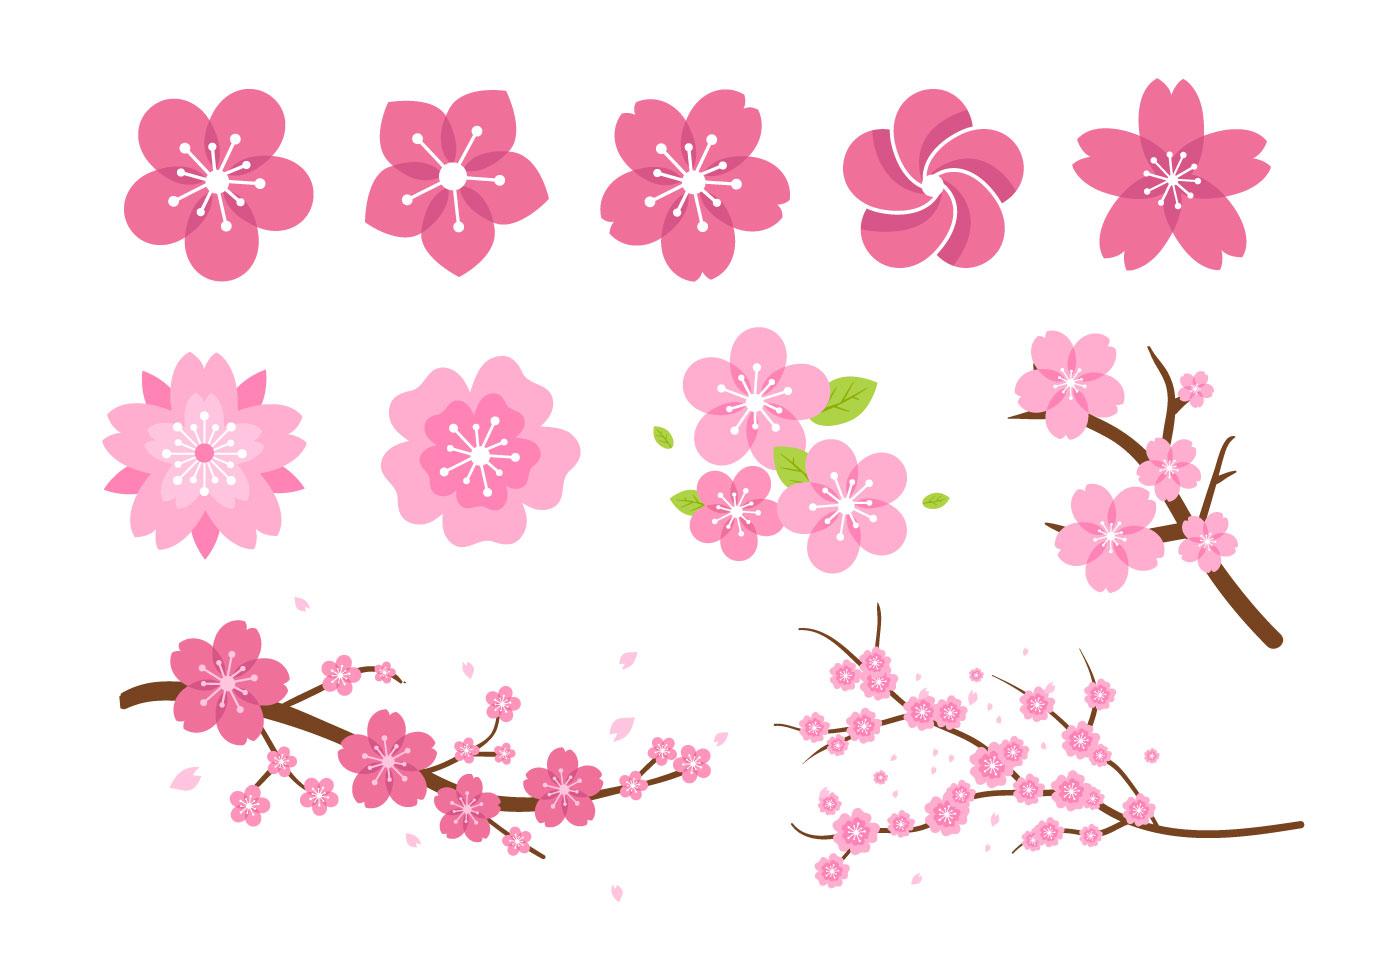 Pink Flower Blossom Vectors Download Free Vector Art Stock